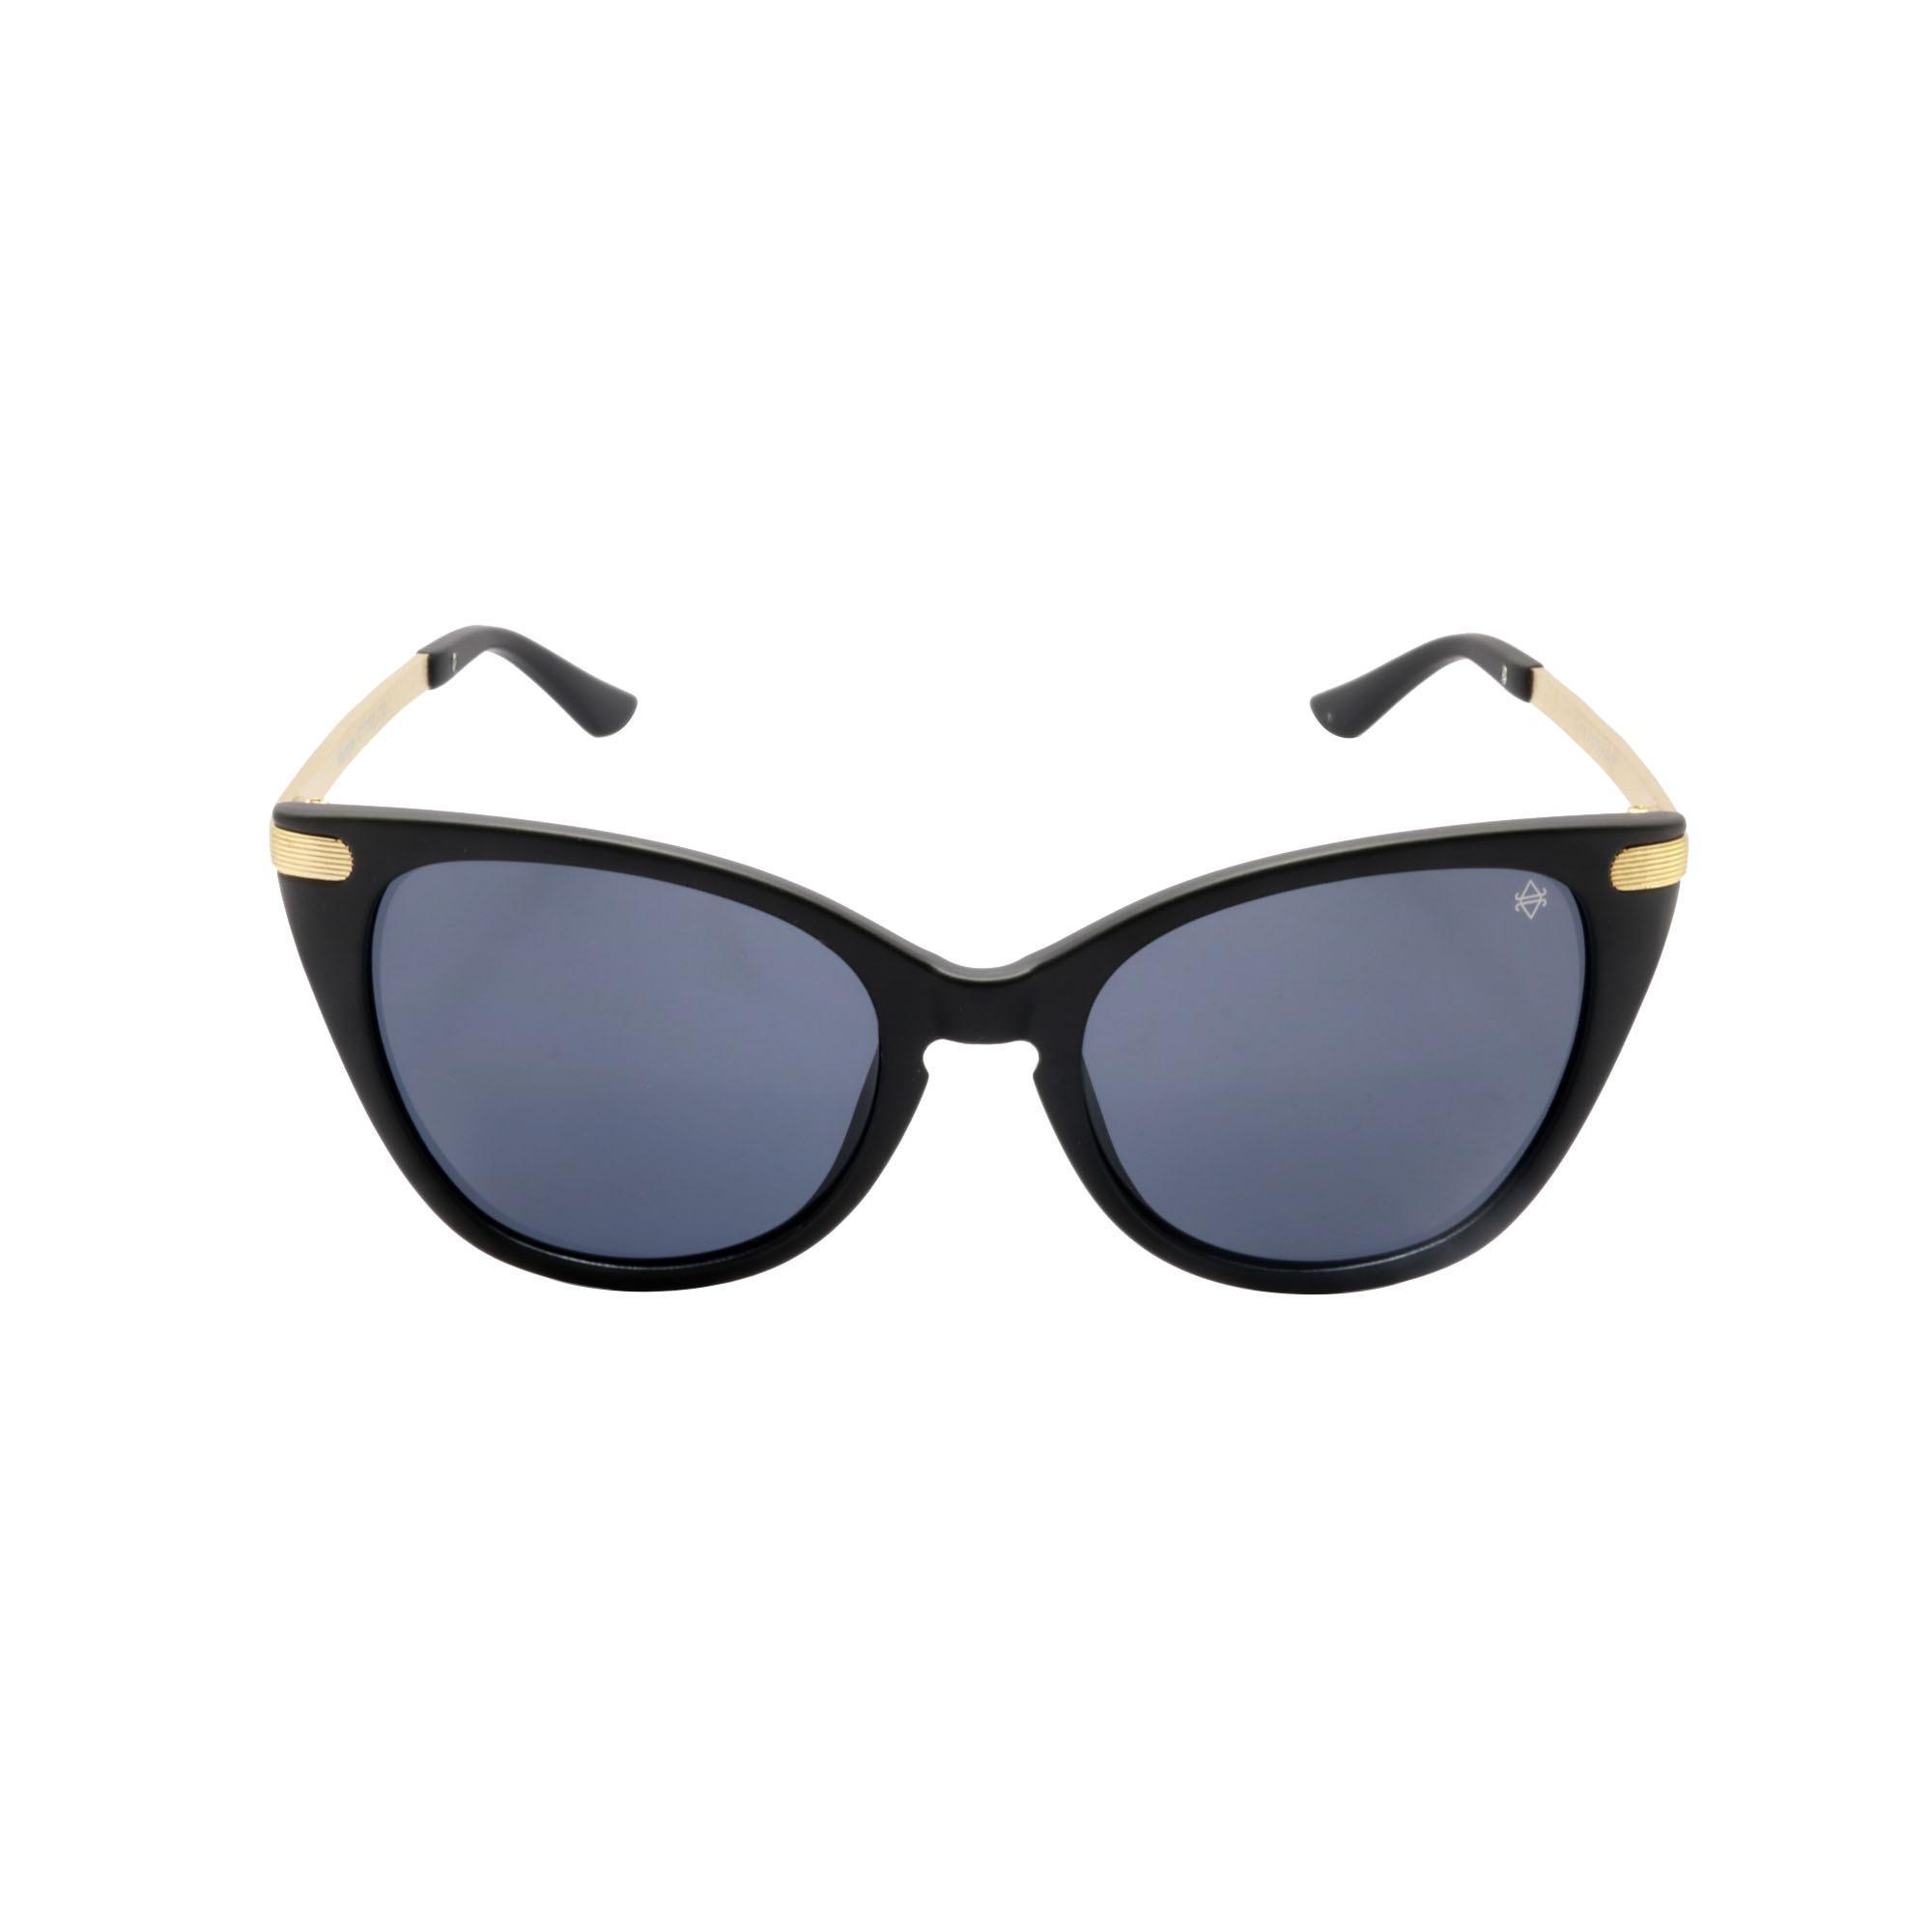 b55081dce85 Philippines. Shanghai AT17553 C12 Cat Eye Women Sunglasses (Black Gold  Frame